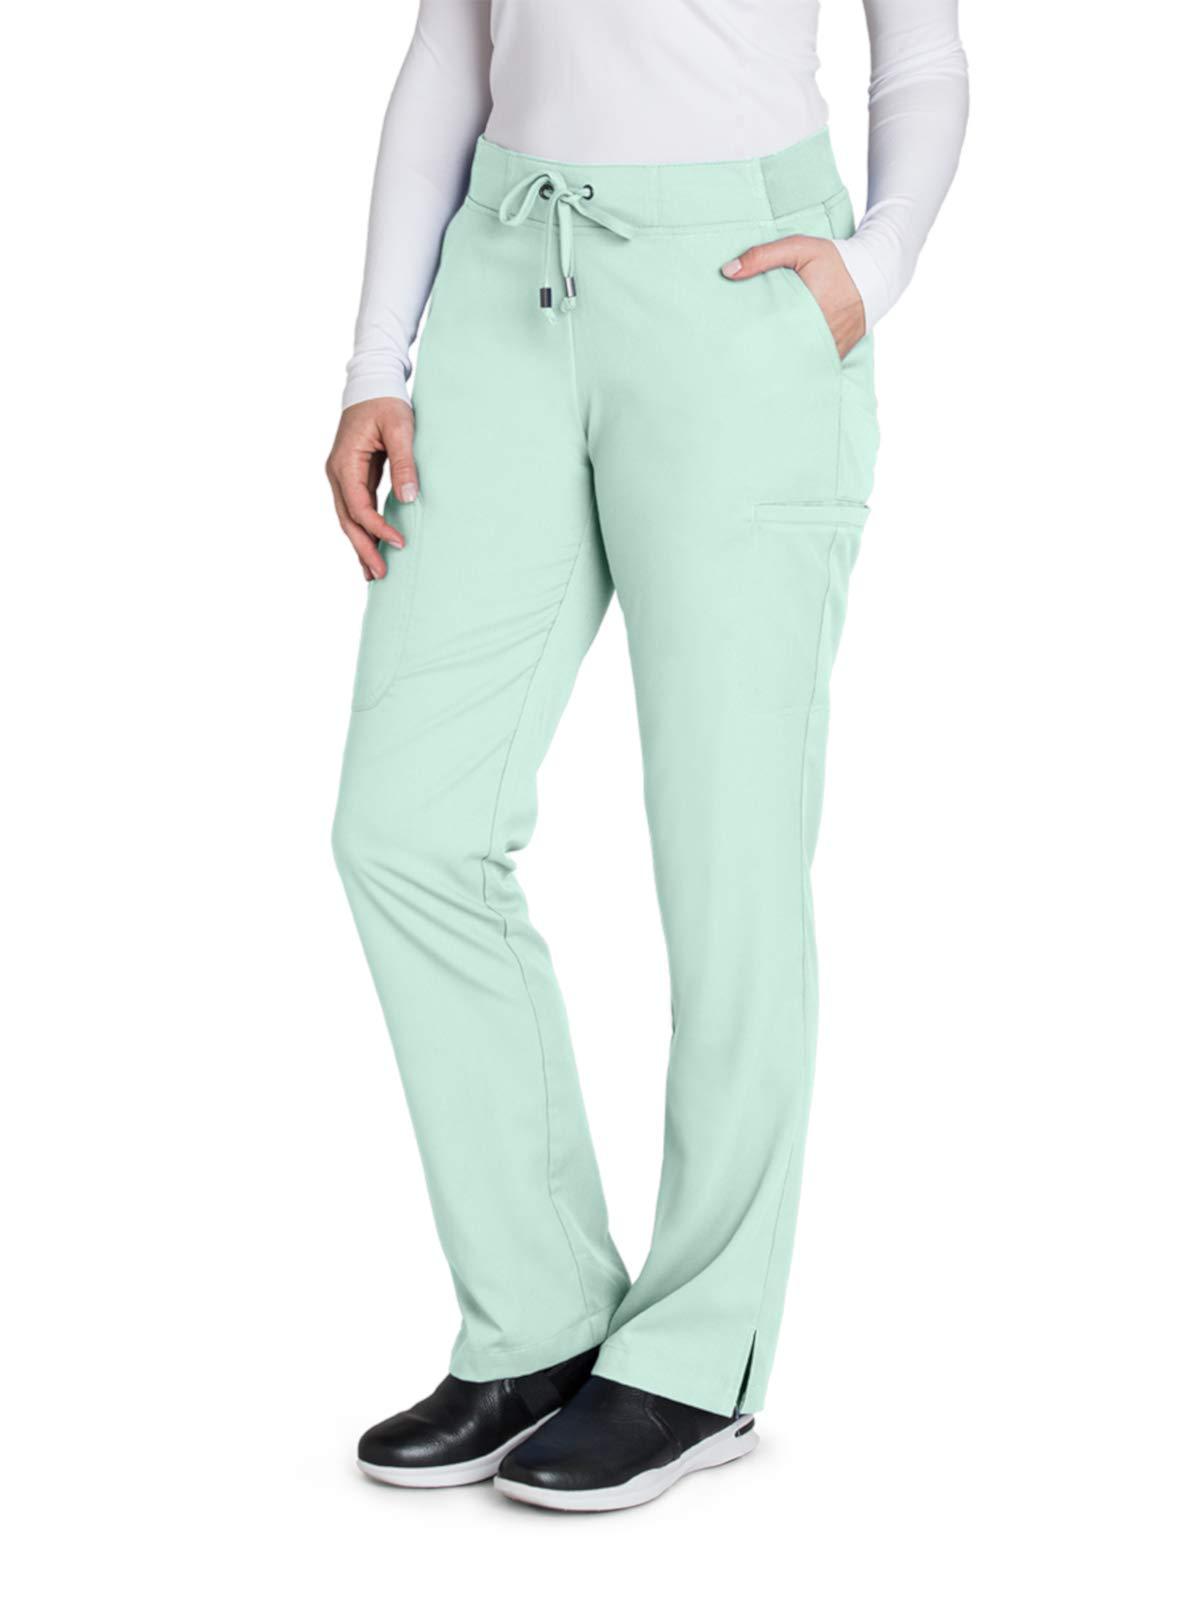 Grey's Anatomy 4277 Straight Leg Pant Aqua Mist XL by Barco